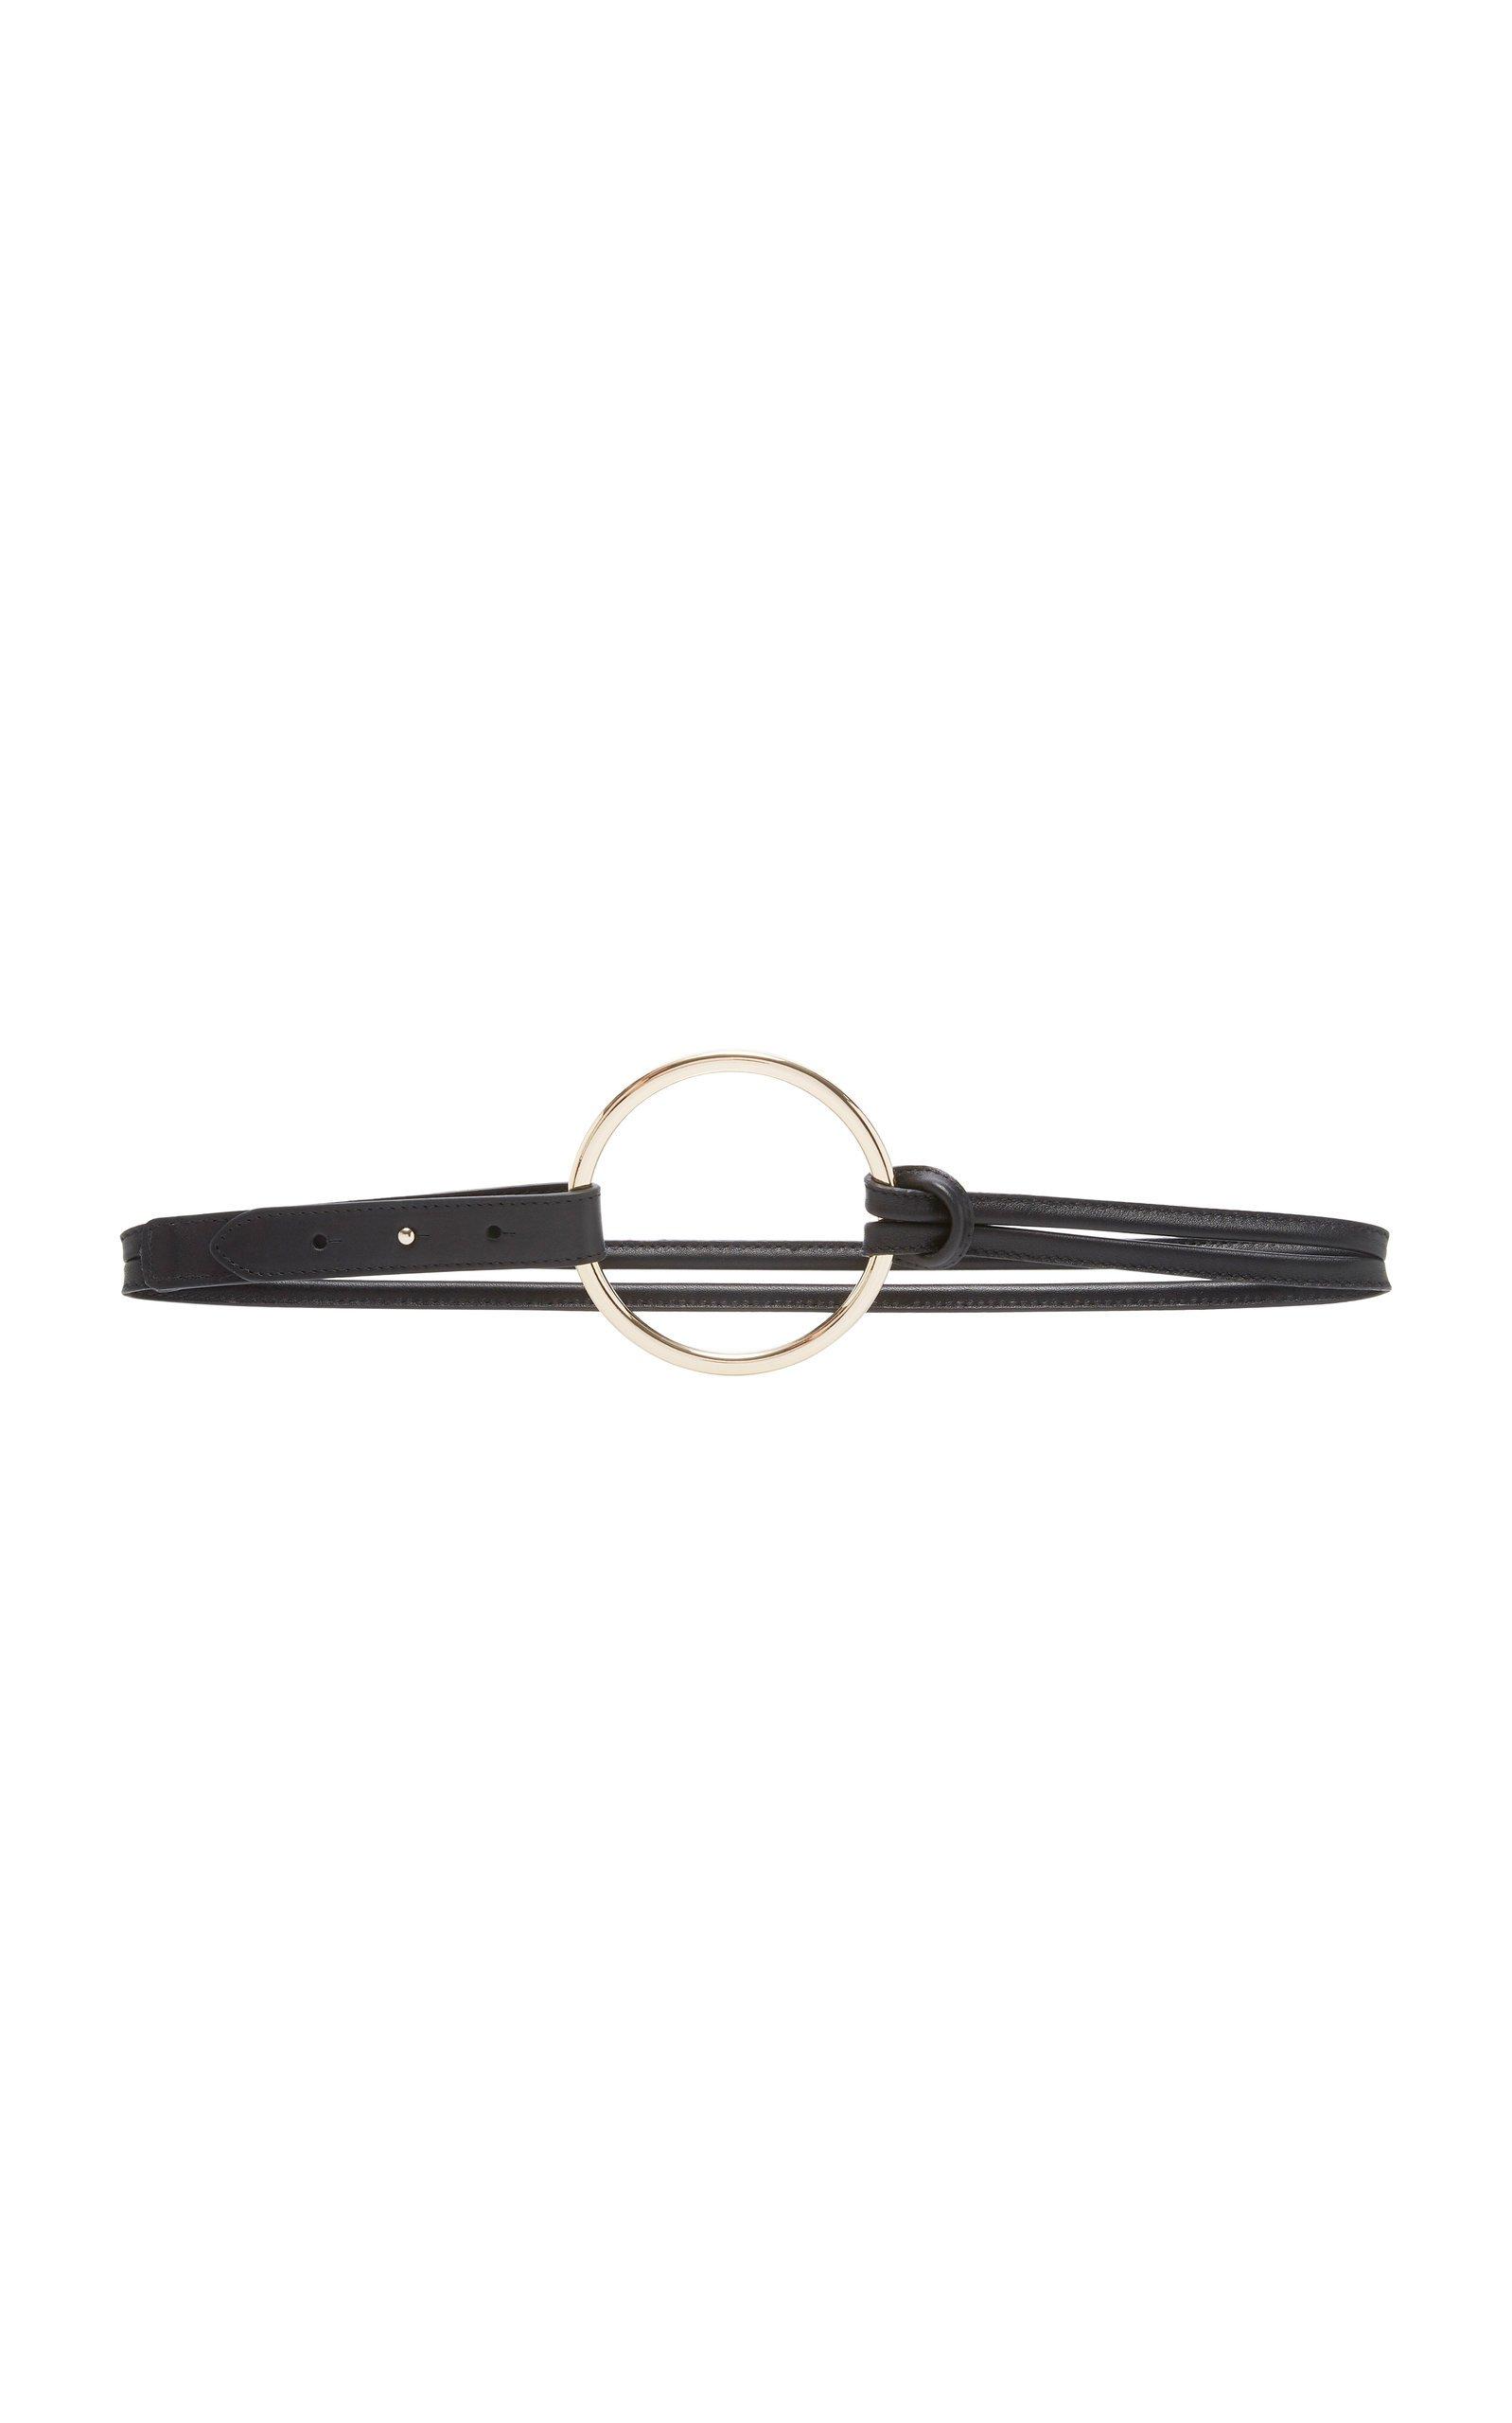 Maison Boinet Double Strap Ring Leather Belt